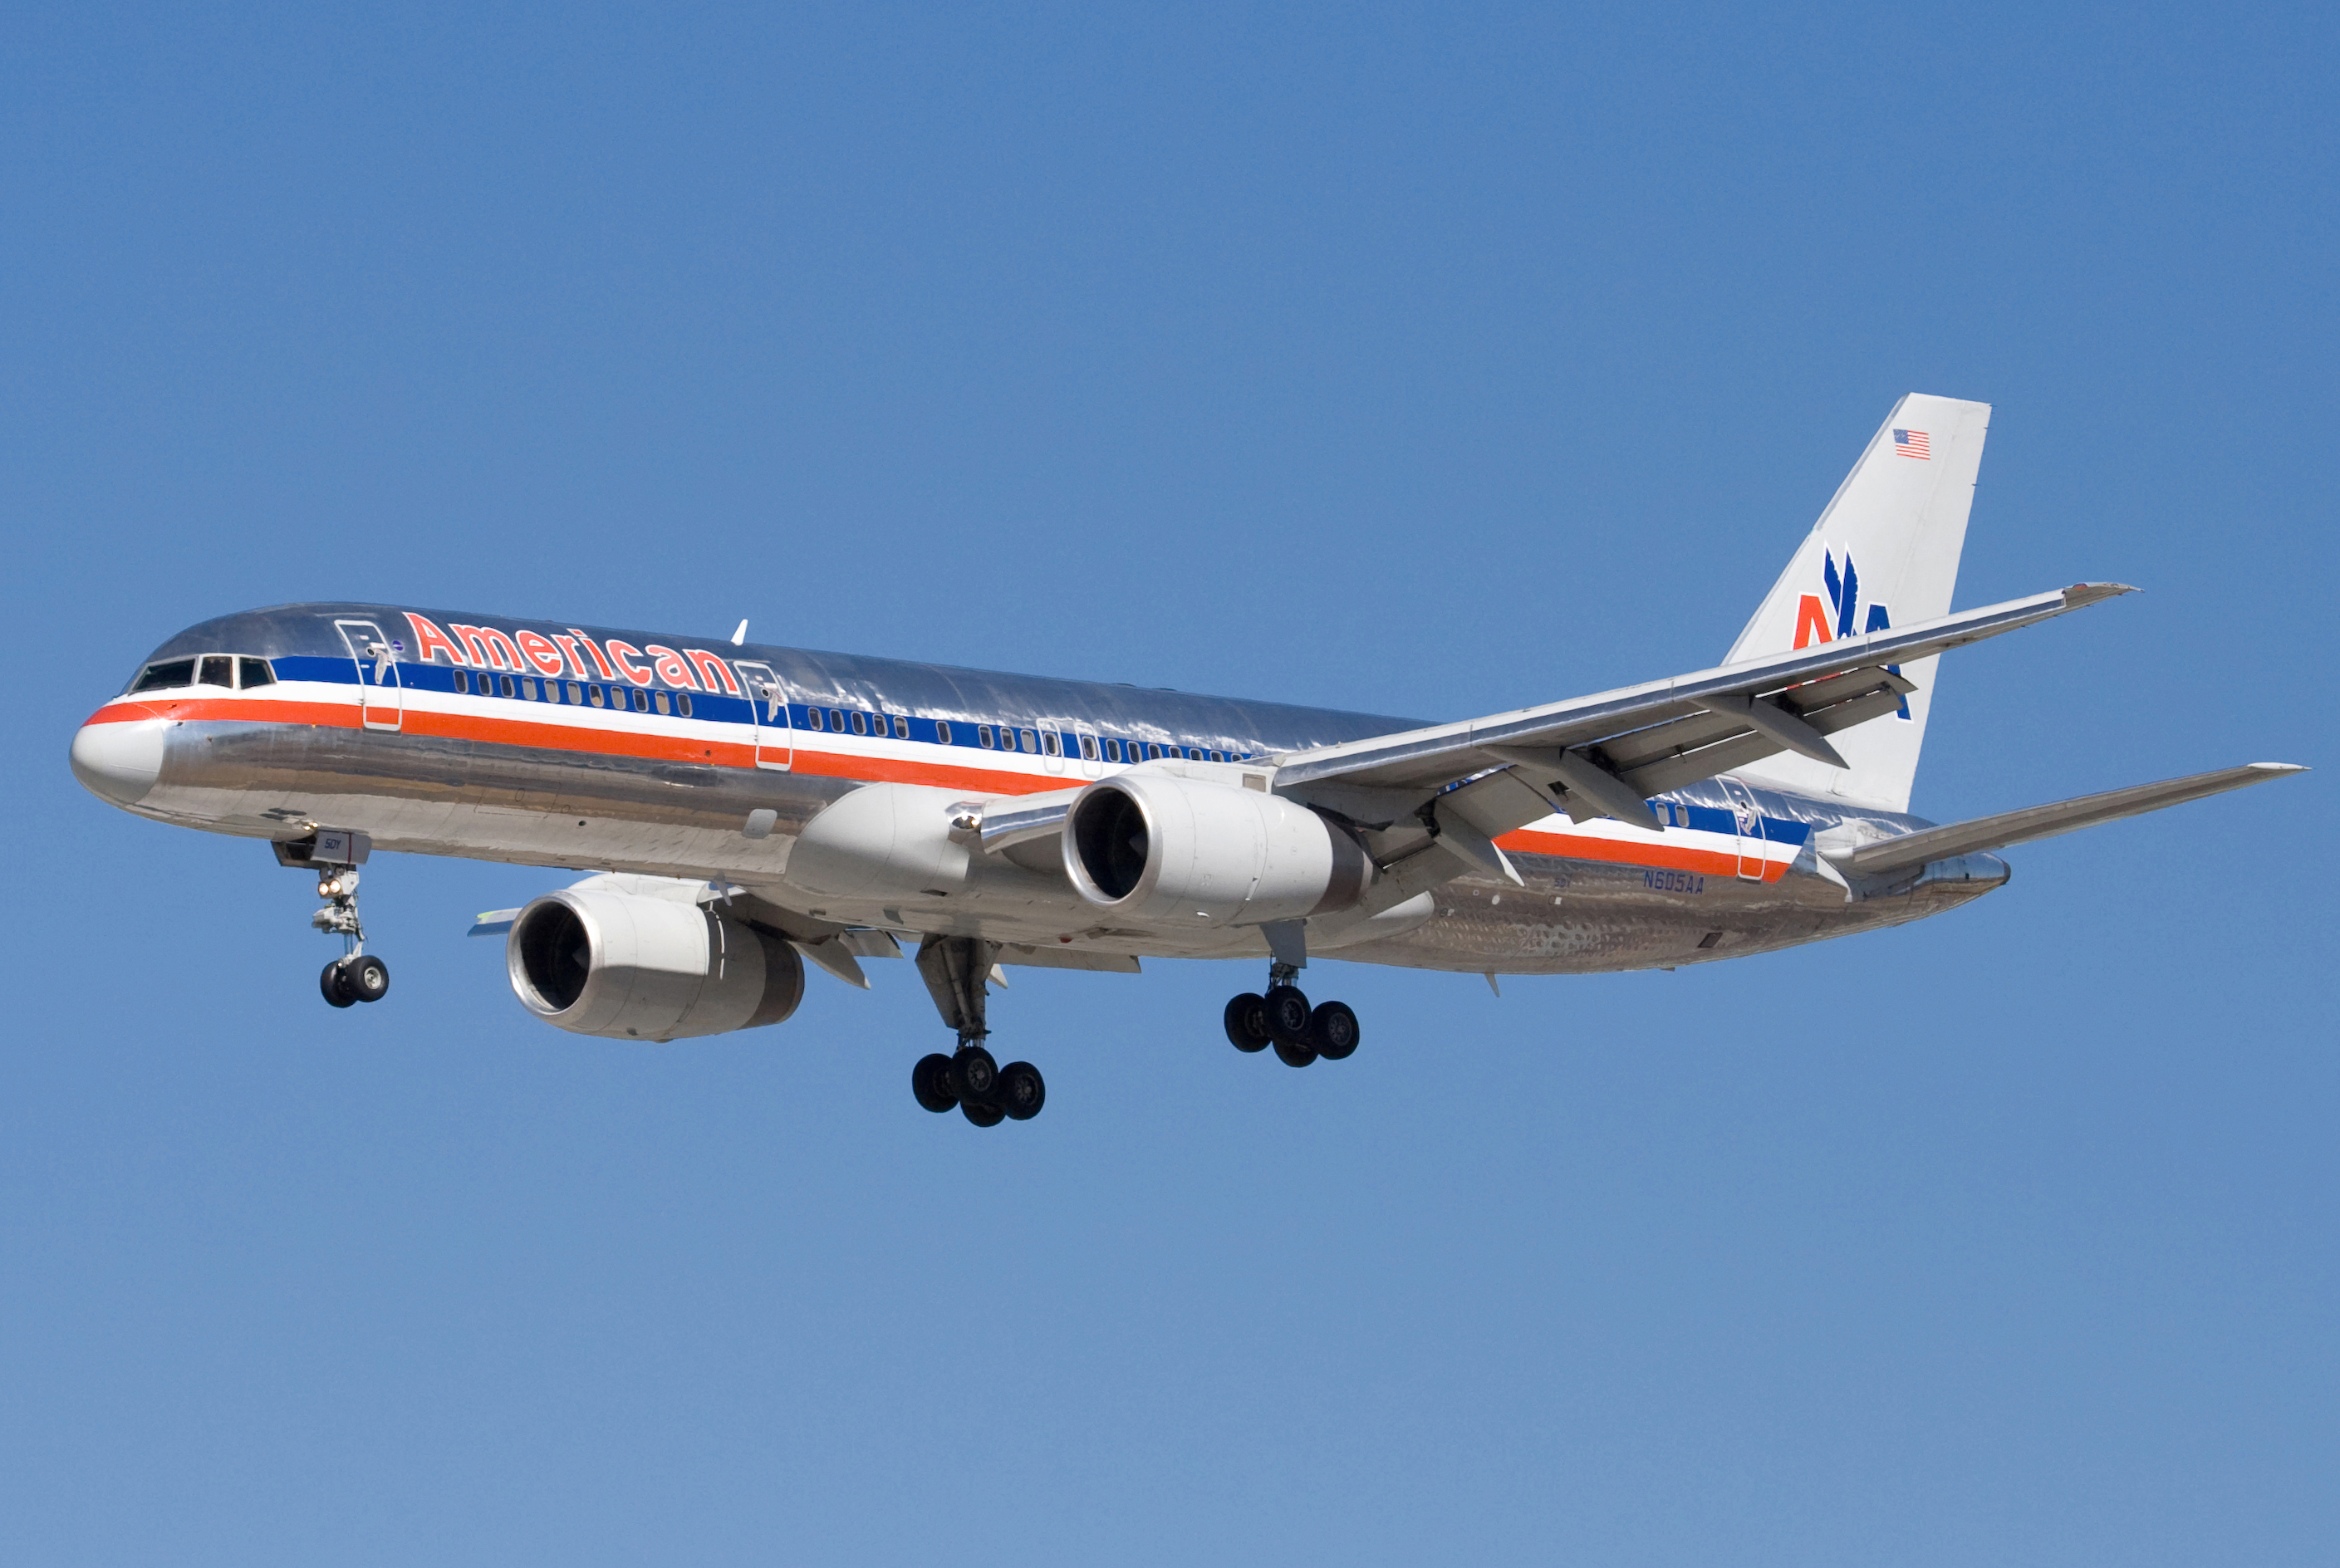 National cargo 757